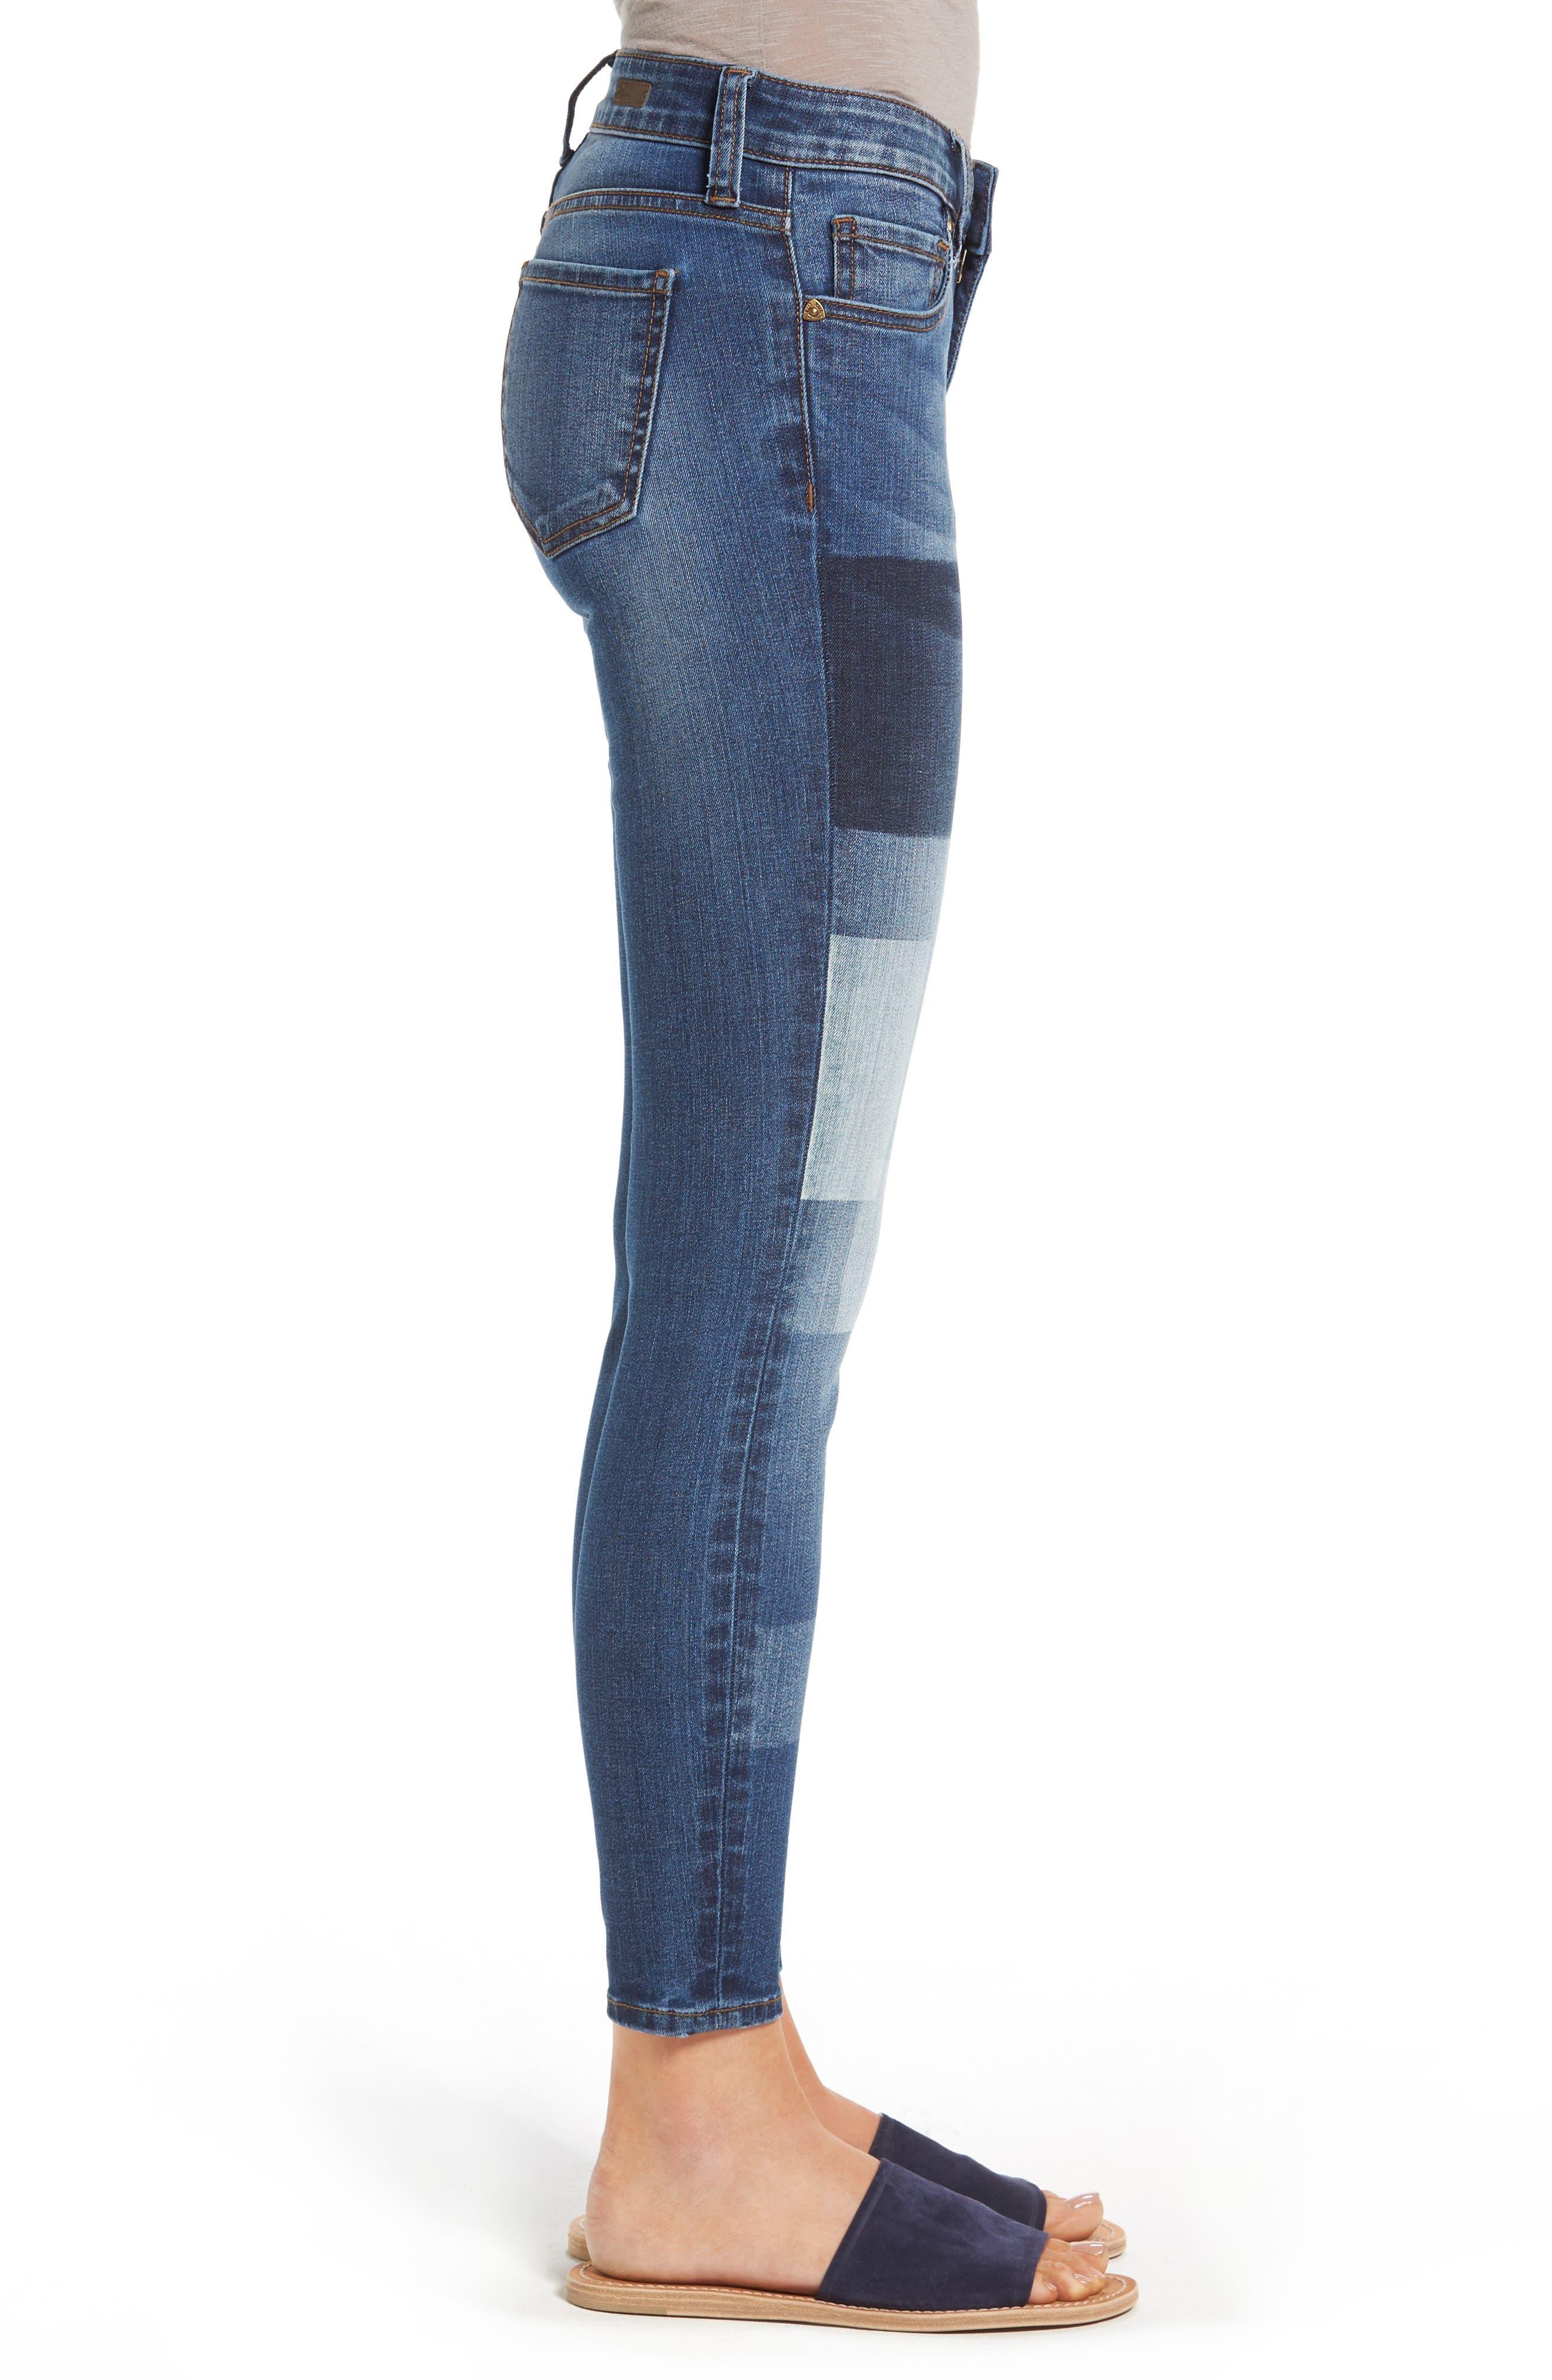 Patchwork Fade Skinny Jeans,                             Alternate thumbnail 3, color,                             Coequal / Dark Stone